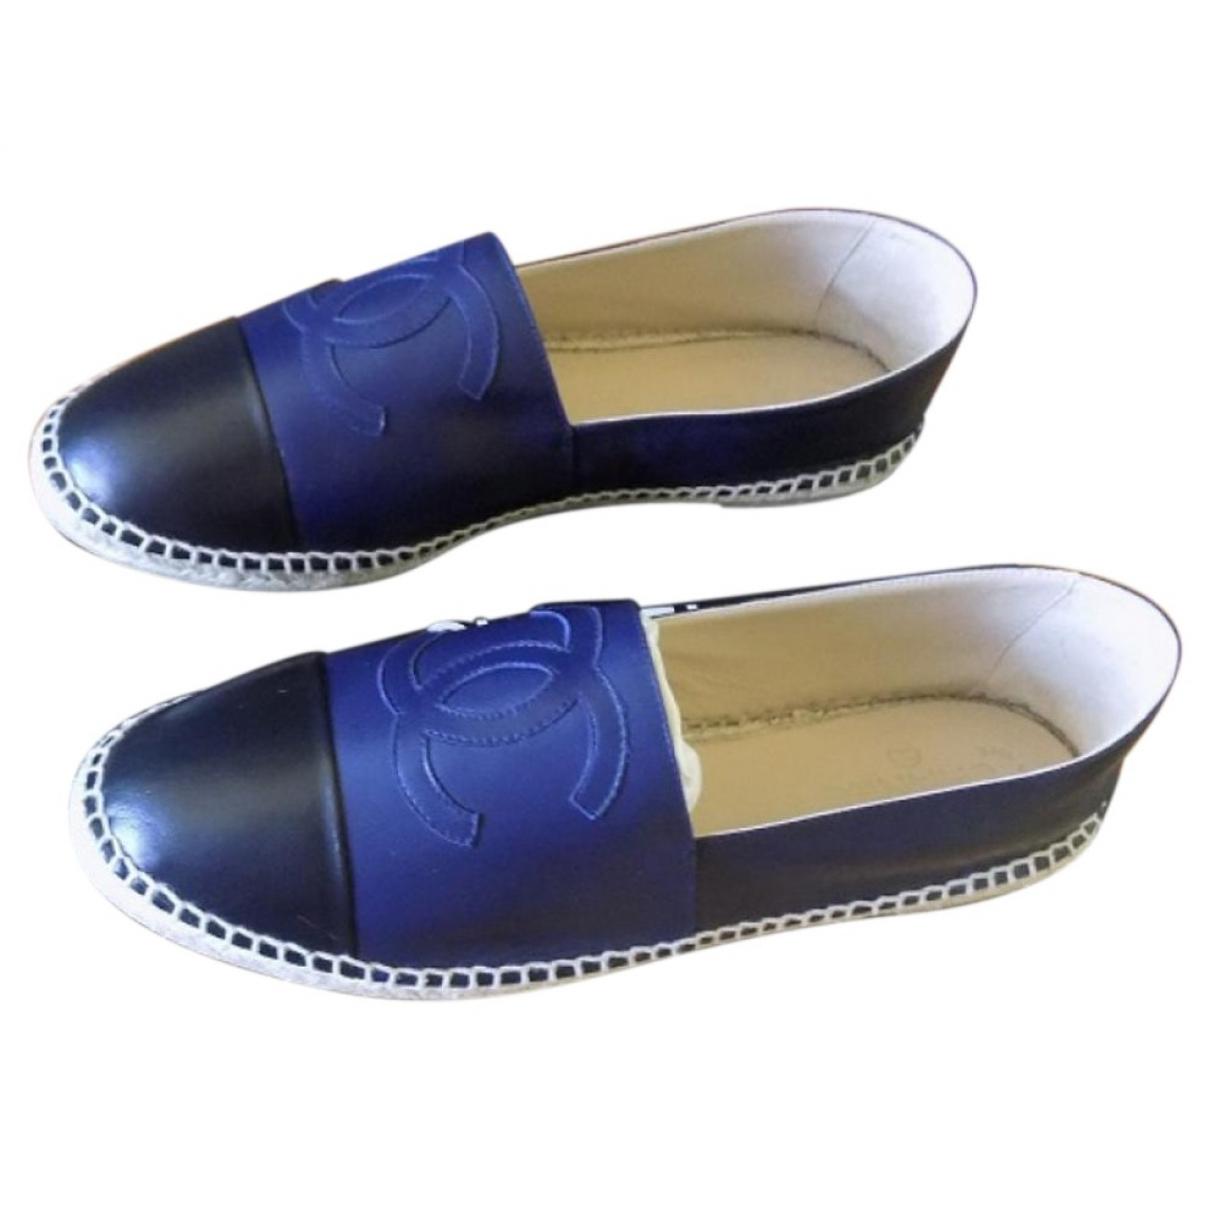 Chanel \N Espadrilles in  Blau Leder